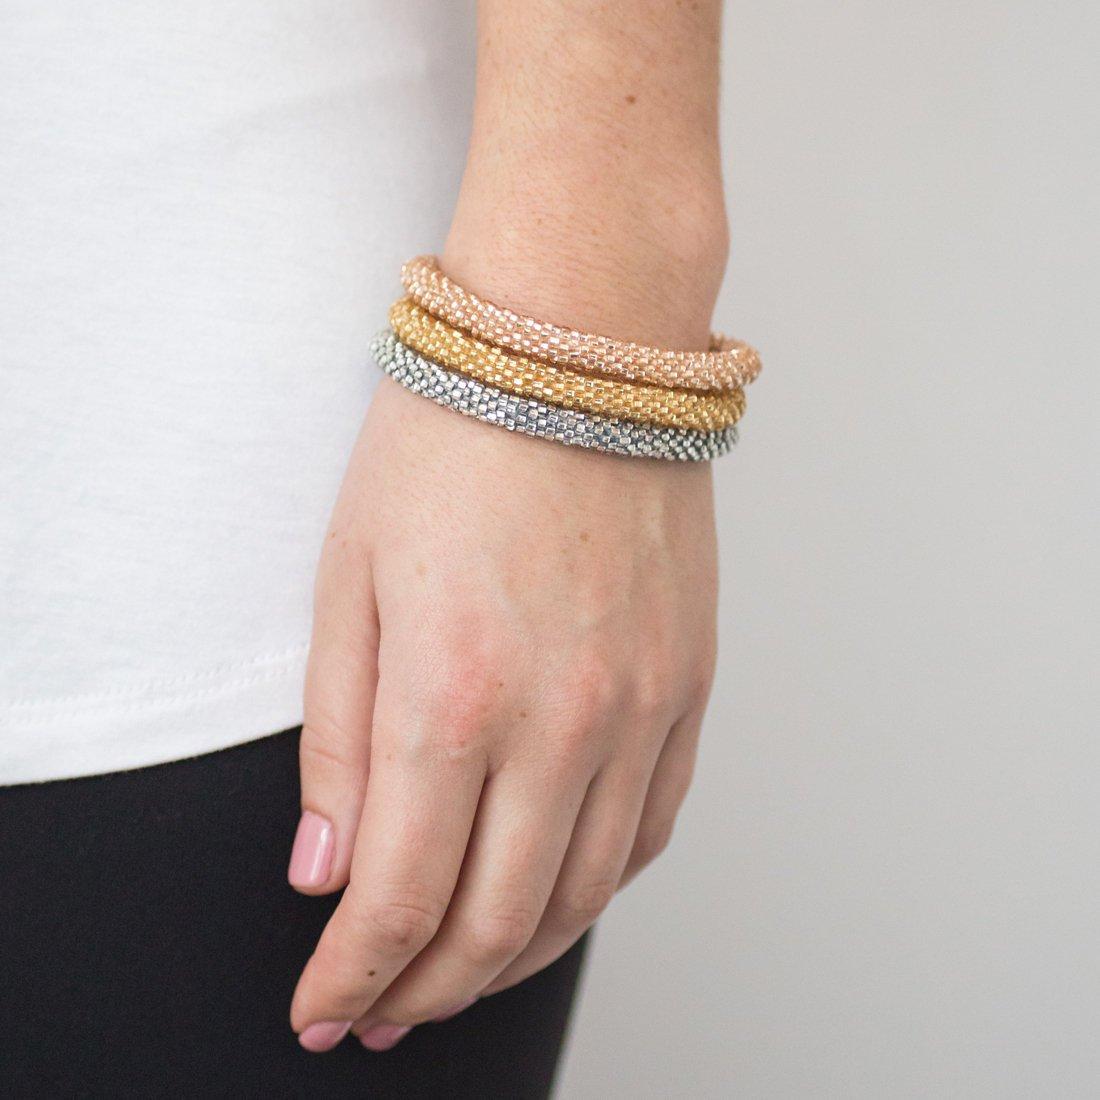 3 sæt Perle armbånd Chic